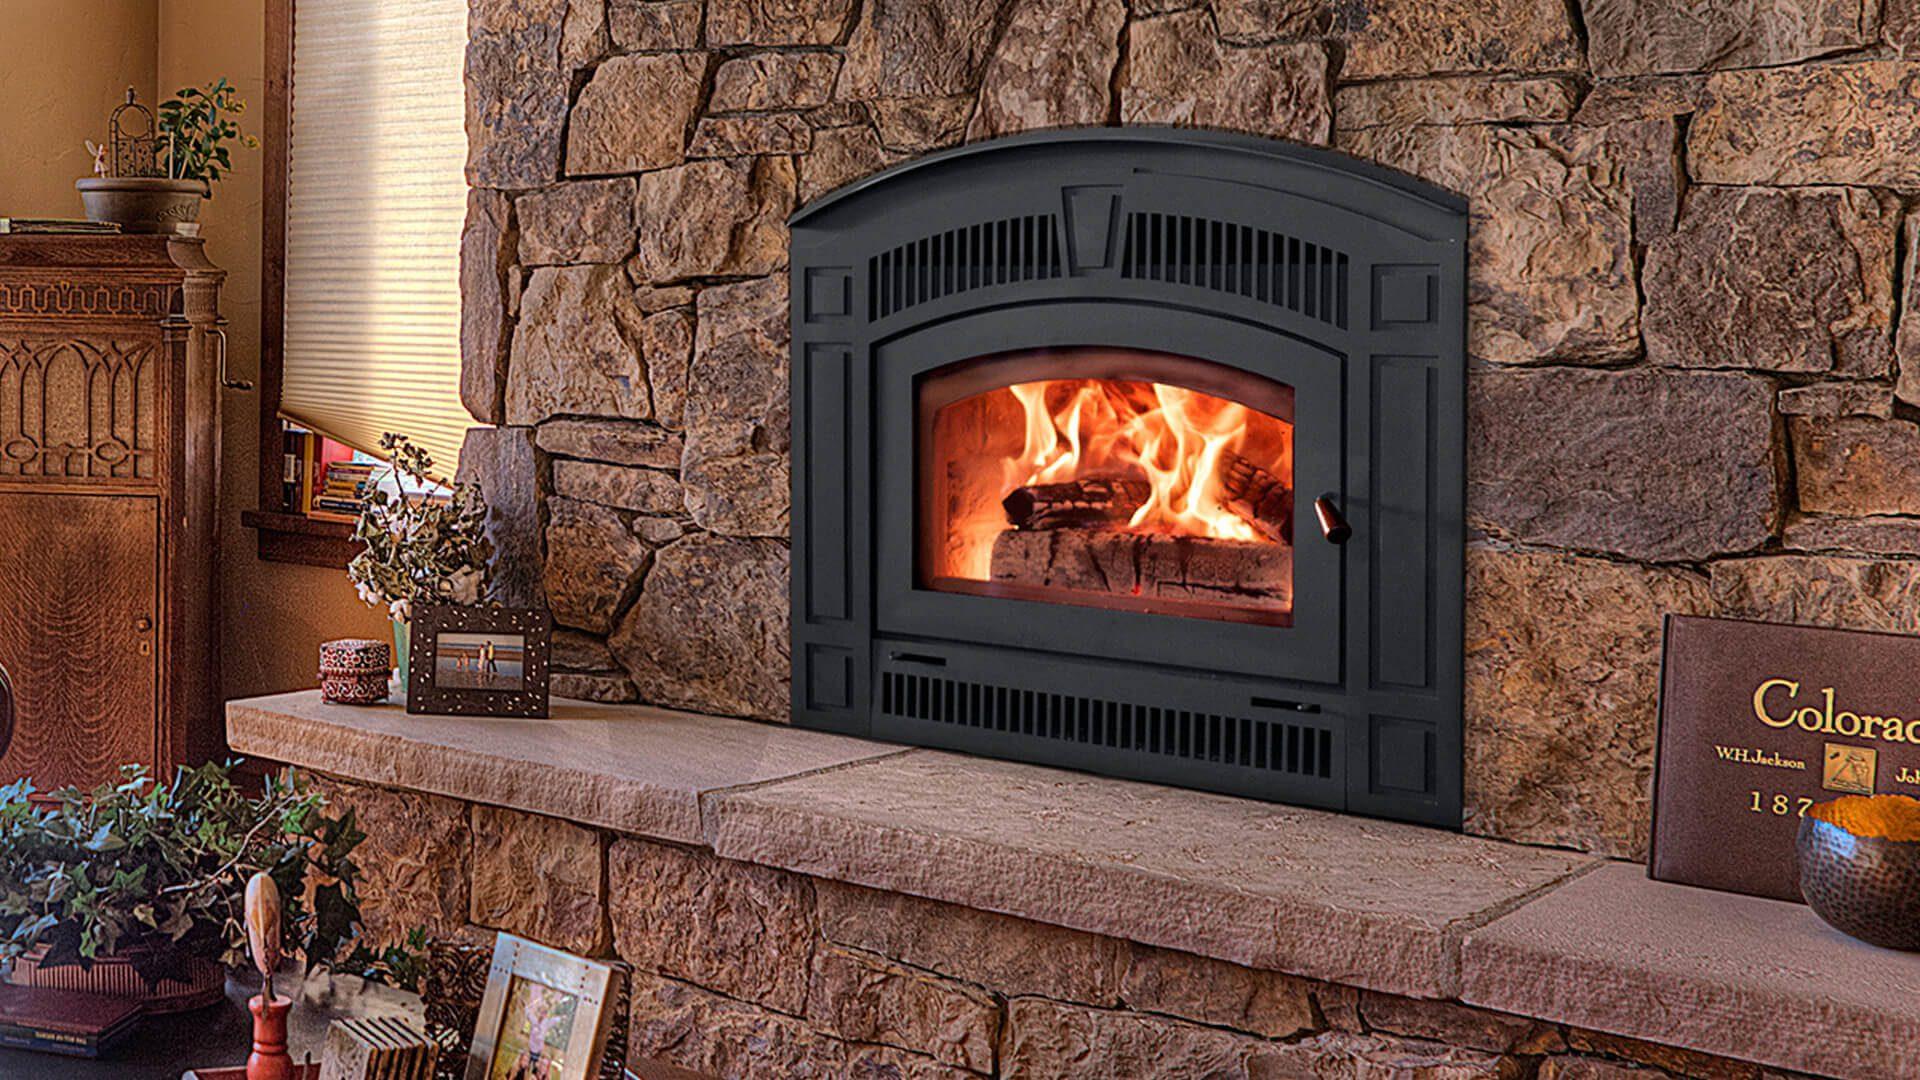 Tremendous Wood Fireplaces Archives Cedar Hearth Mick Gage Plumbing Interior Design Ideas Tzicisoteloinfo